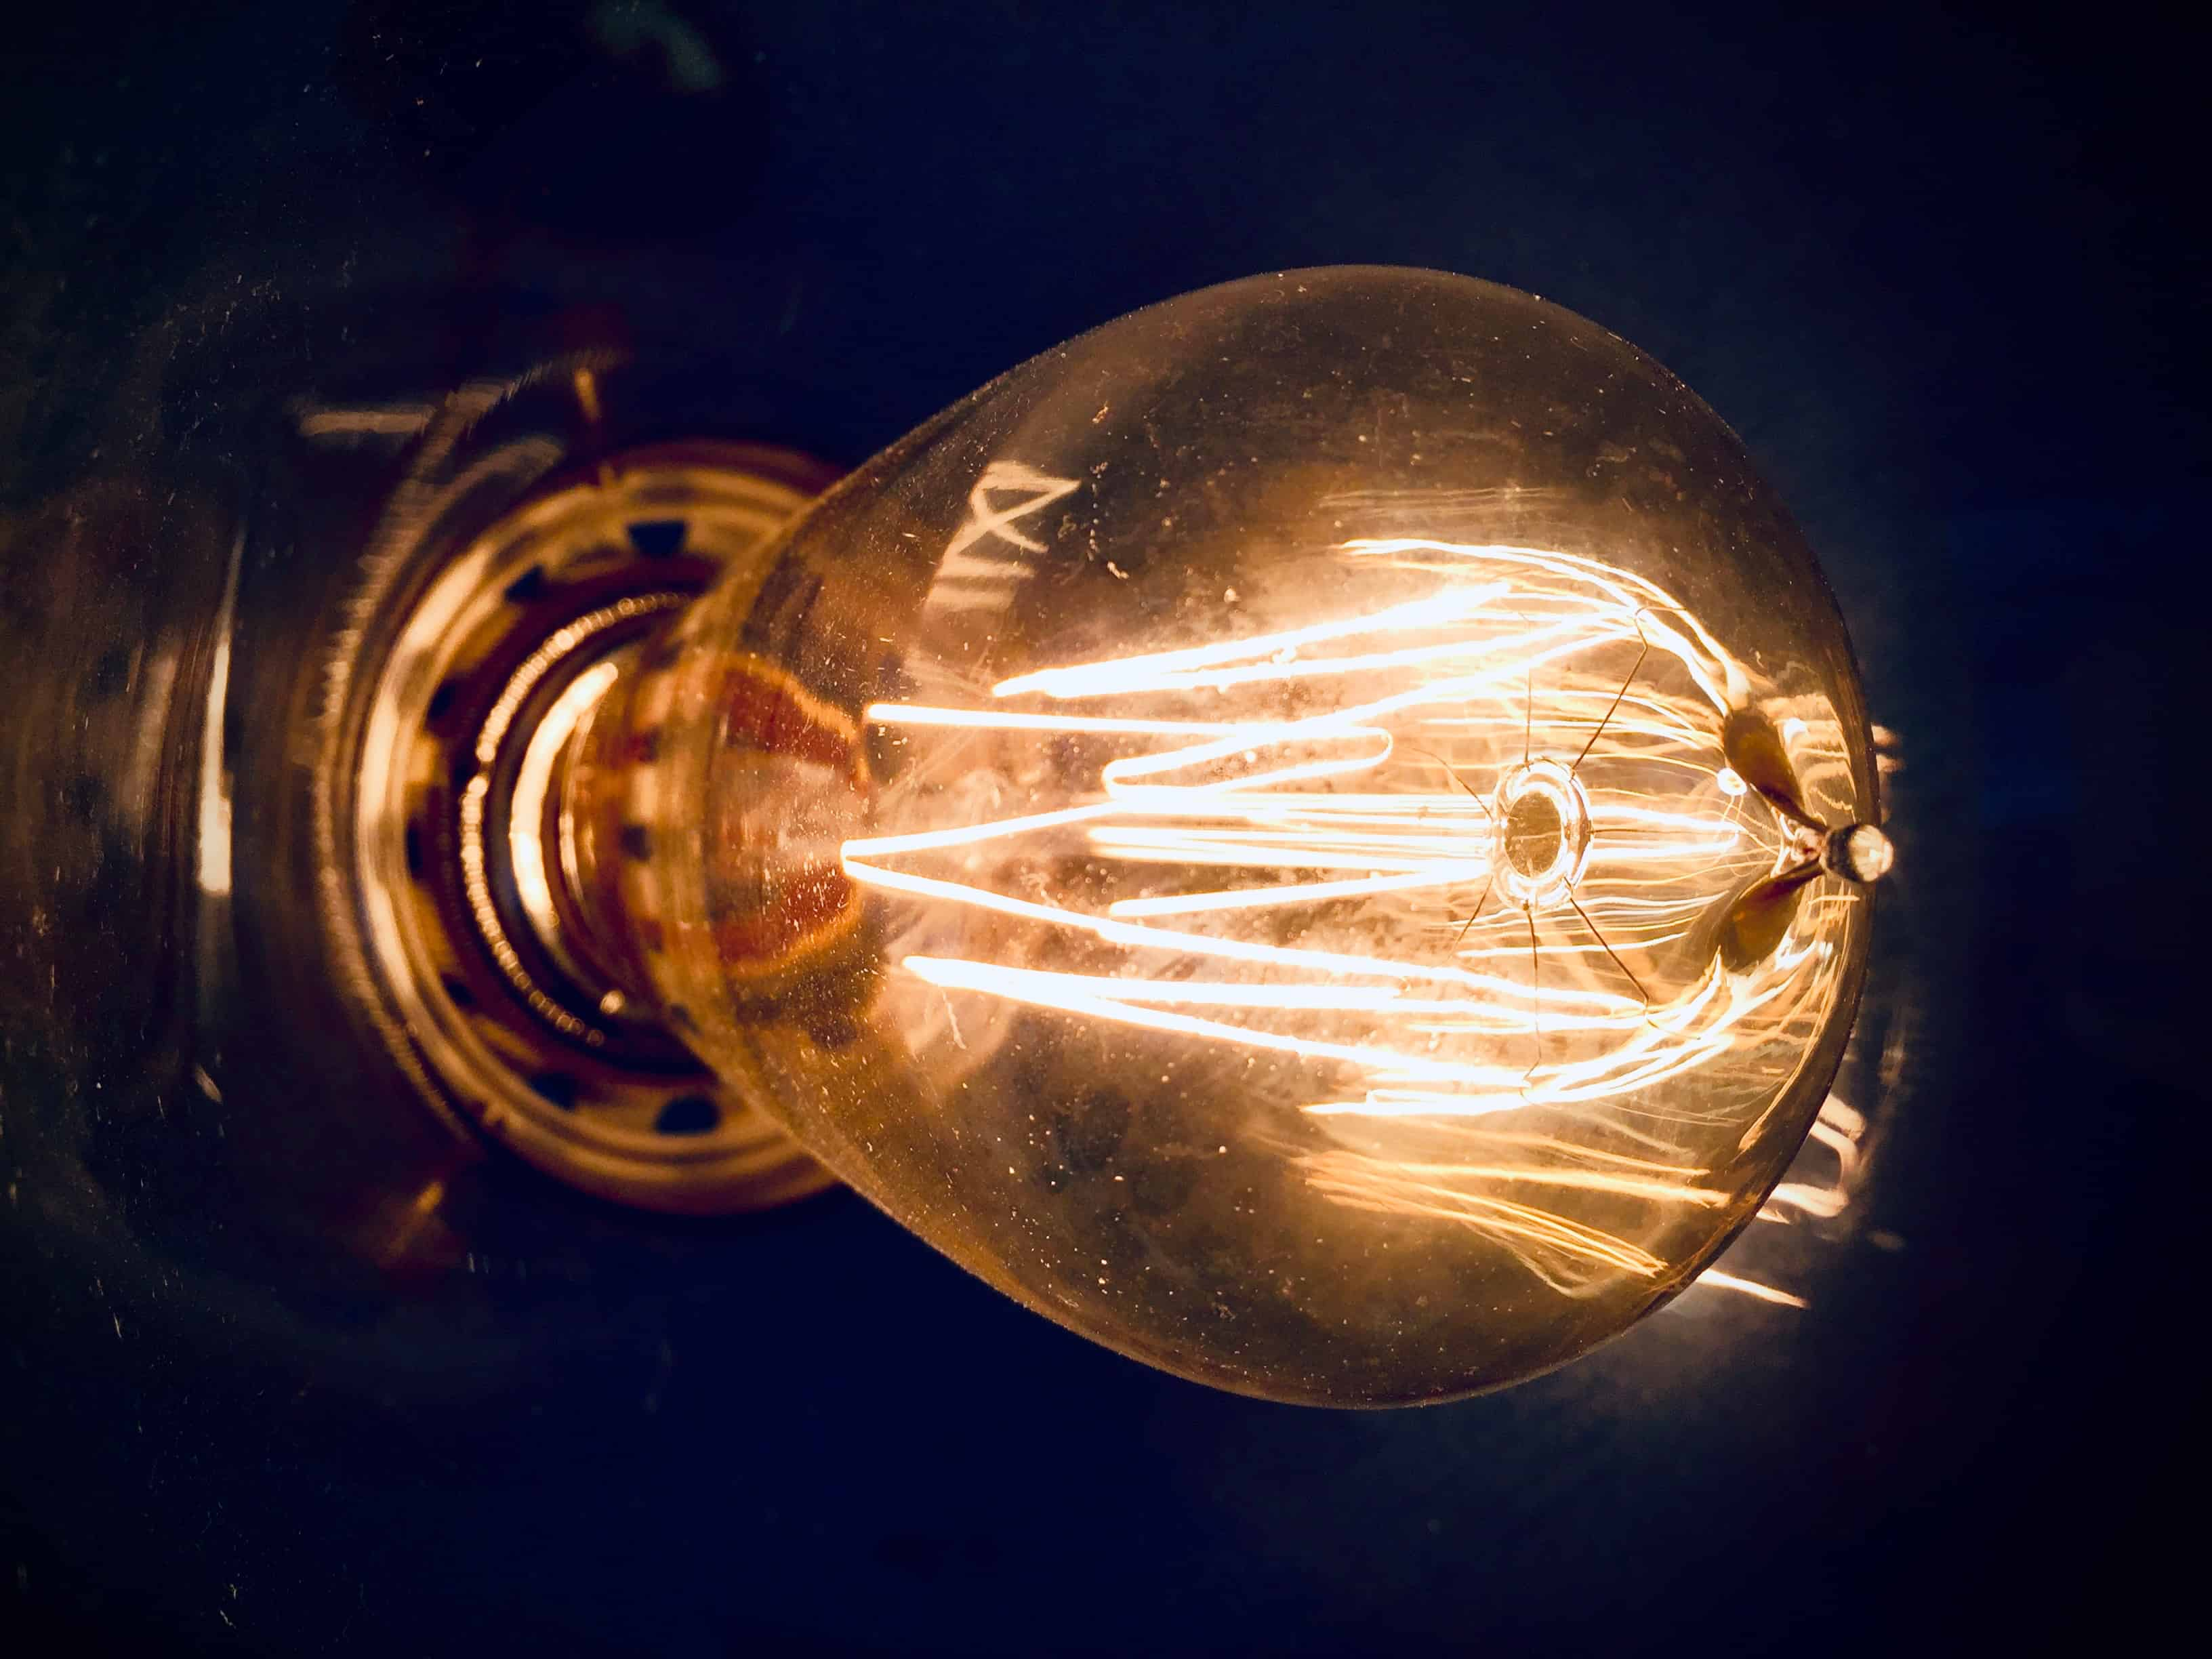 Cambridge Centre for Alternative Finance Launches Energy Consumption Tracker for Bitcoin